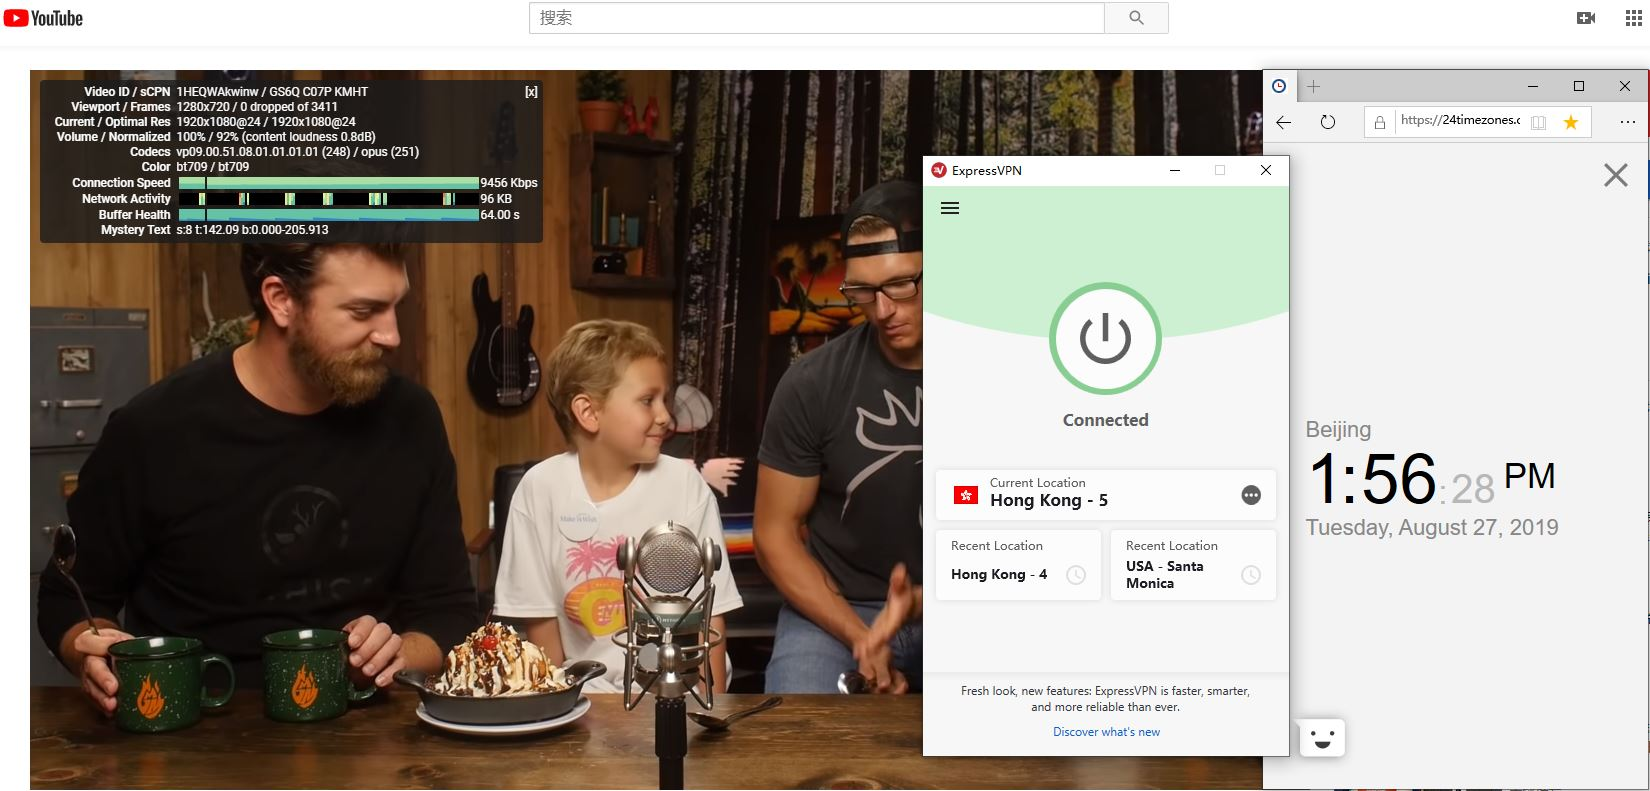 windows expressvpn 香港-5服务器 中国VPN翻墙 科学上网 YouTube速度测试-20190827